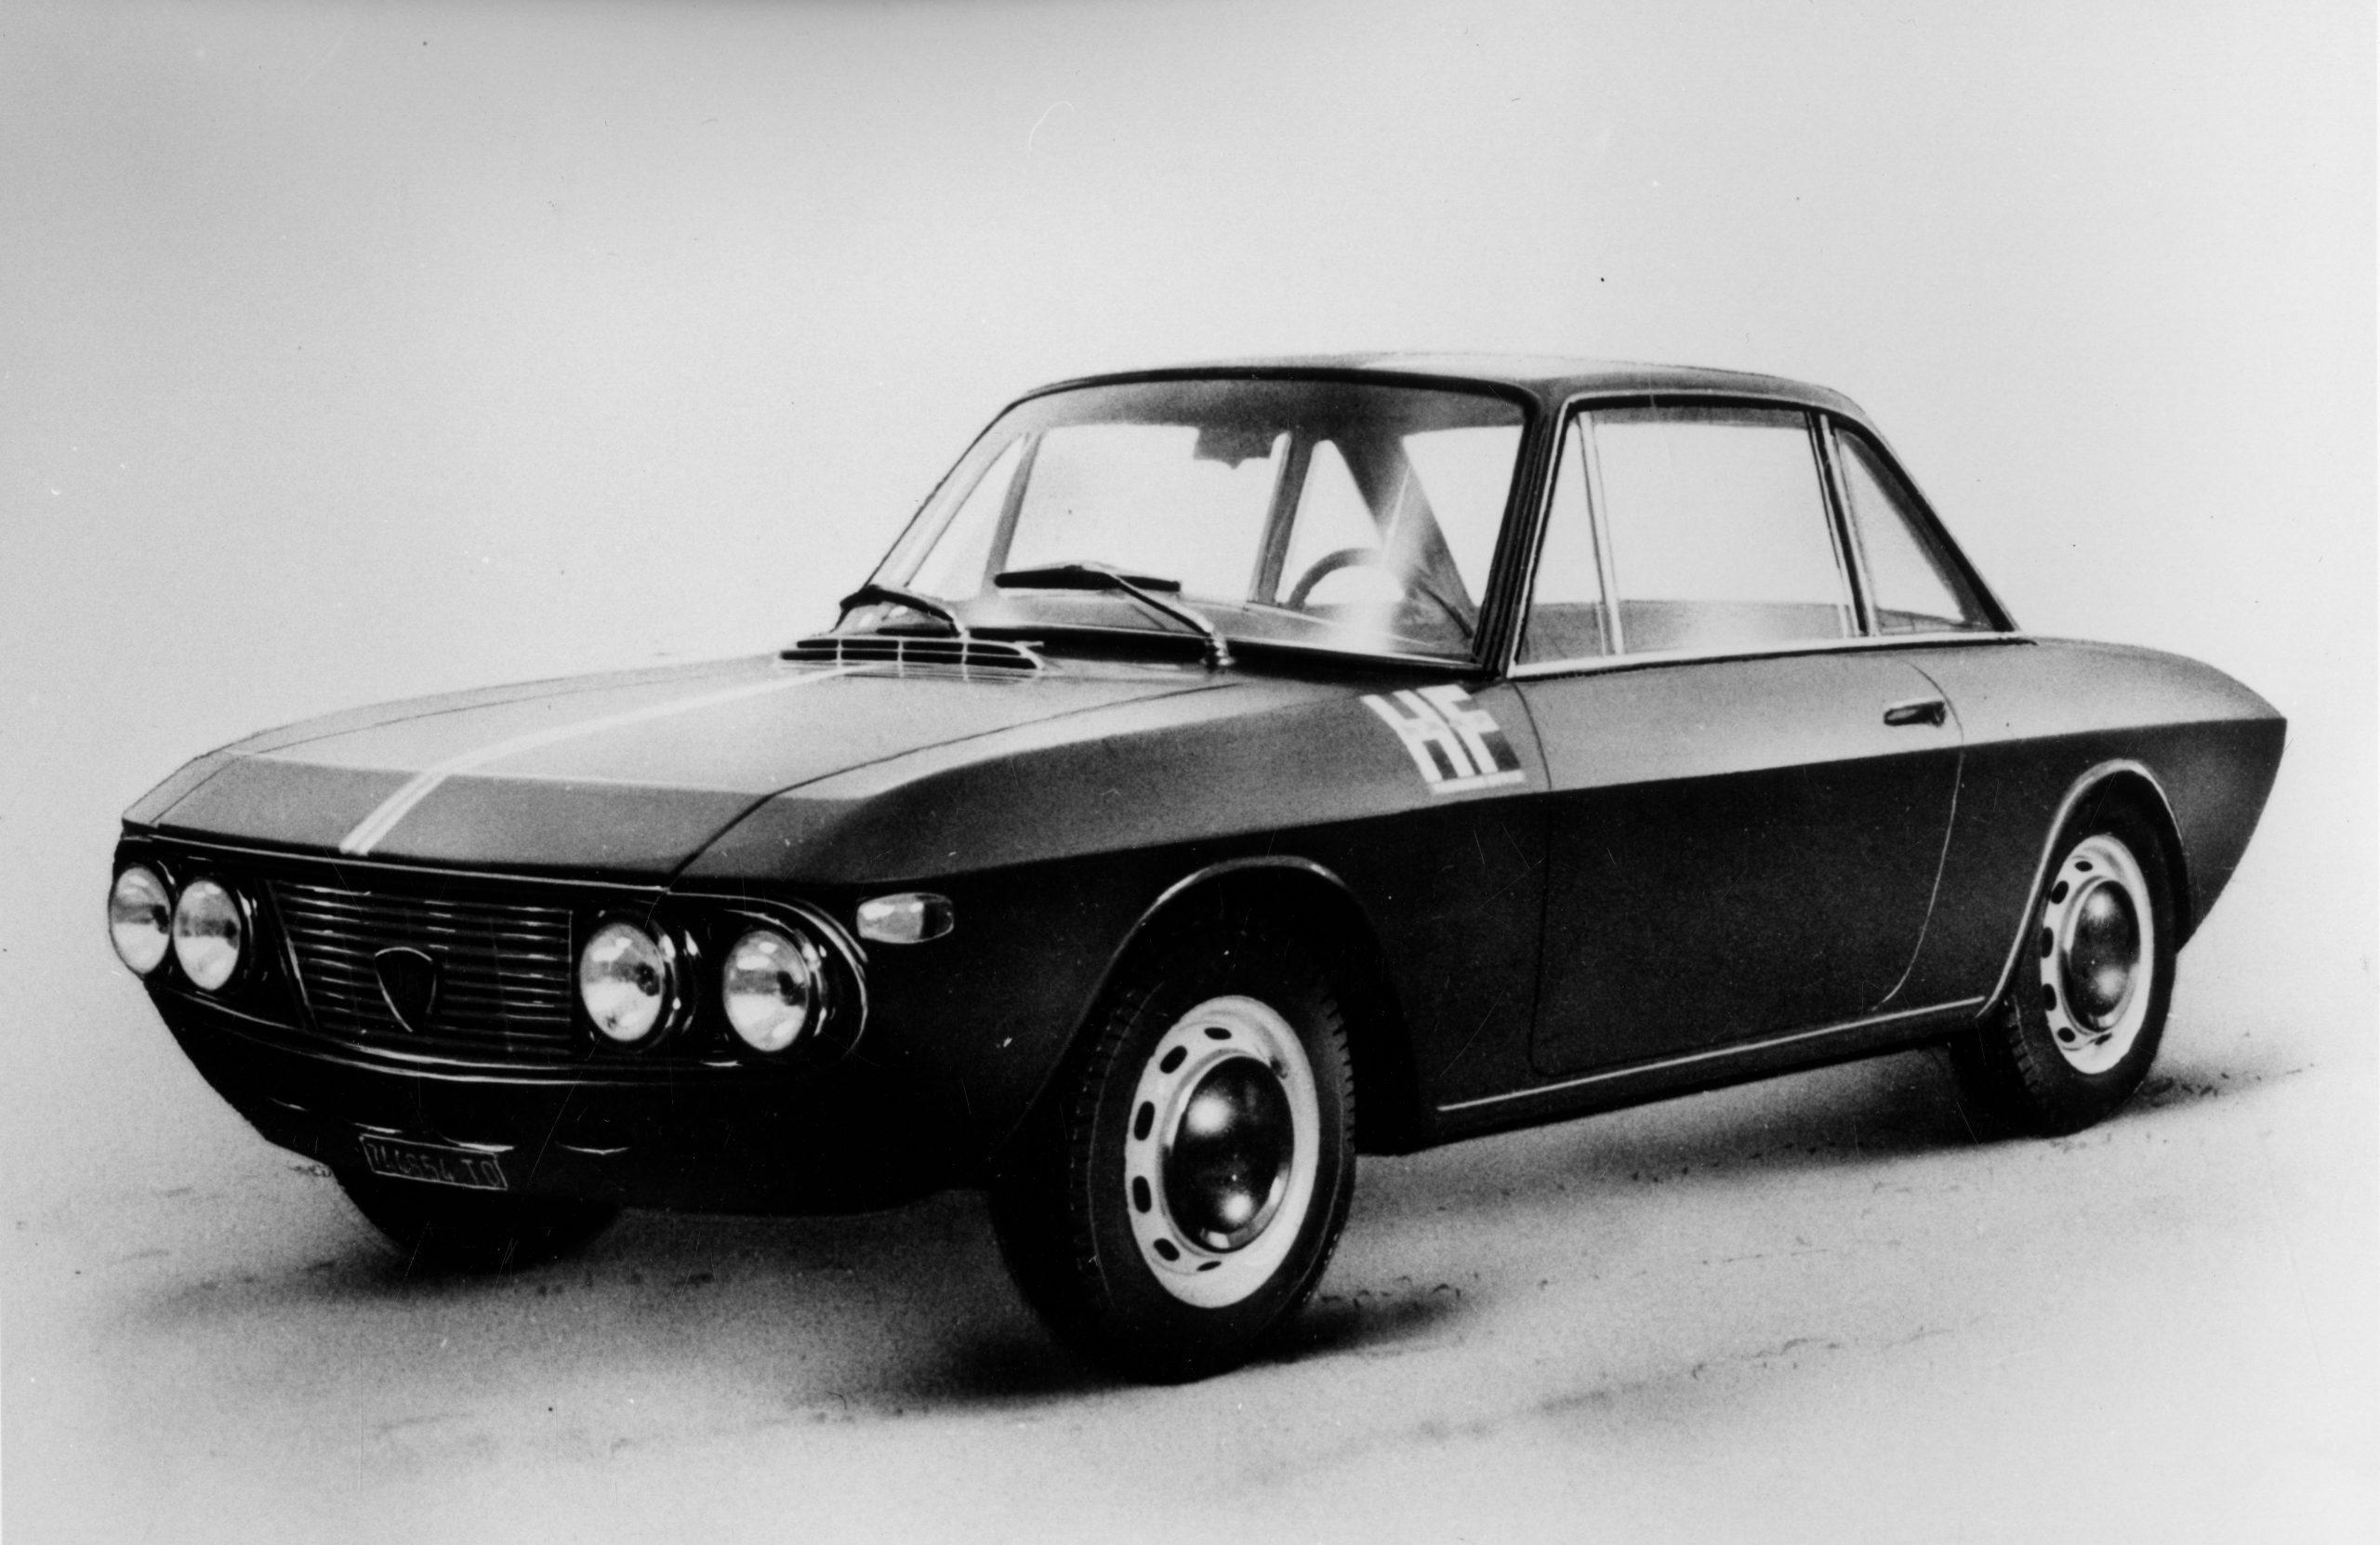 08 Lancia Fulvia Coupe 1.2 HF scaled «Κομψότητα σε κίνηση» : To νέο ντοκιμαντέρ της Lancia, για την 115η επέτειο της Lancia, retro, ειδήσεις, Νέα